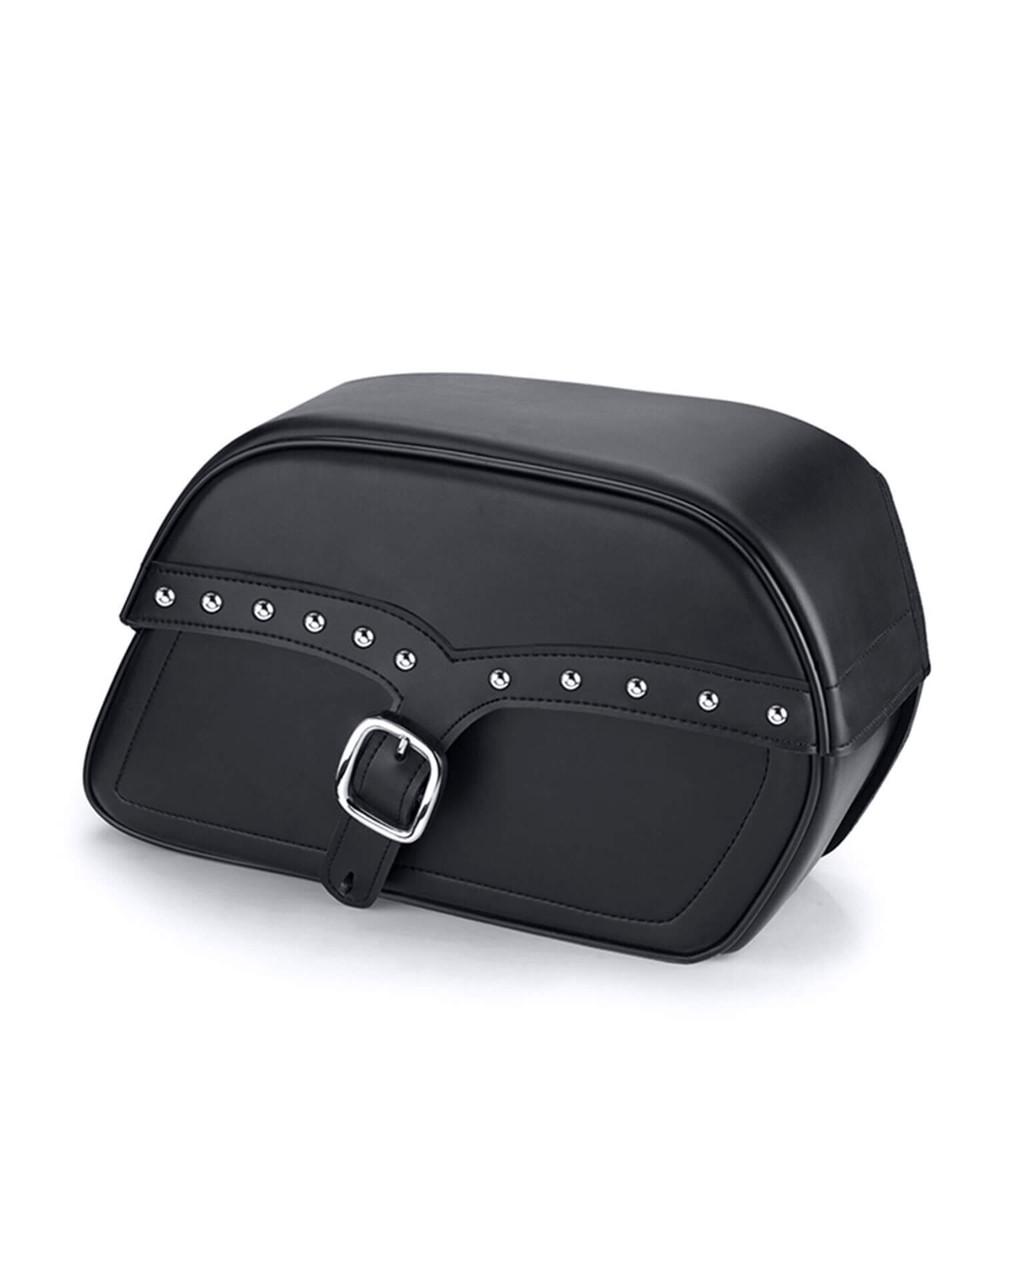 Honda VTX 1300 C Medium SS Slanted Studded Motorcycle Saddlebags Main Bag View